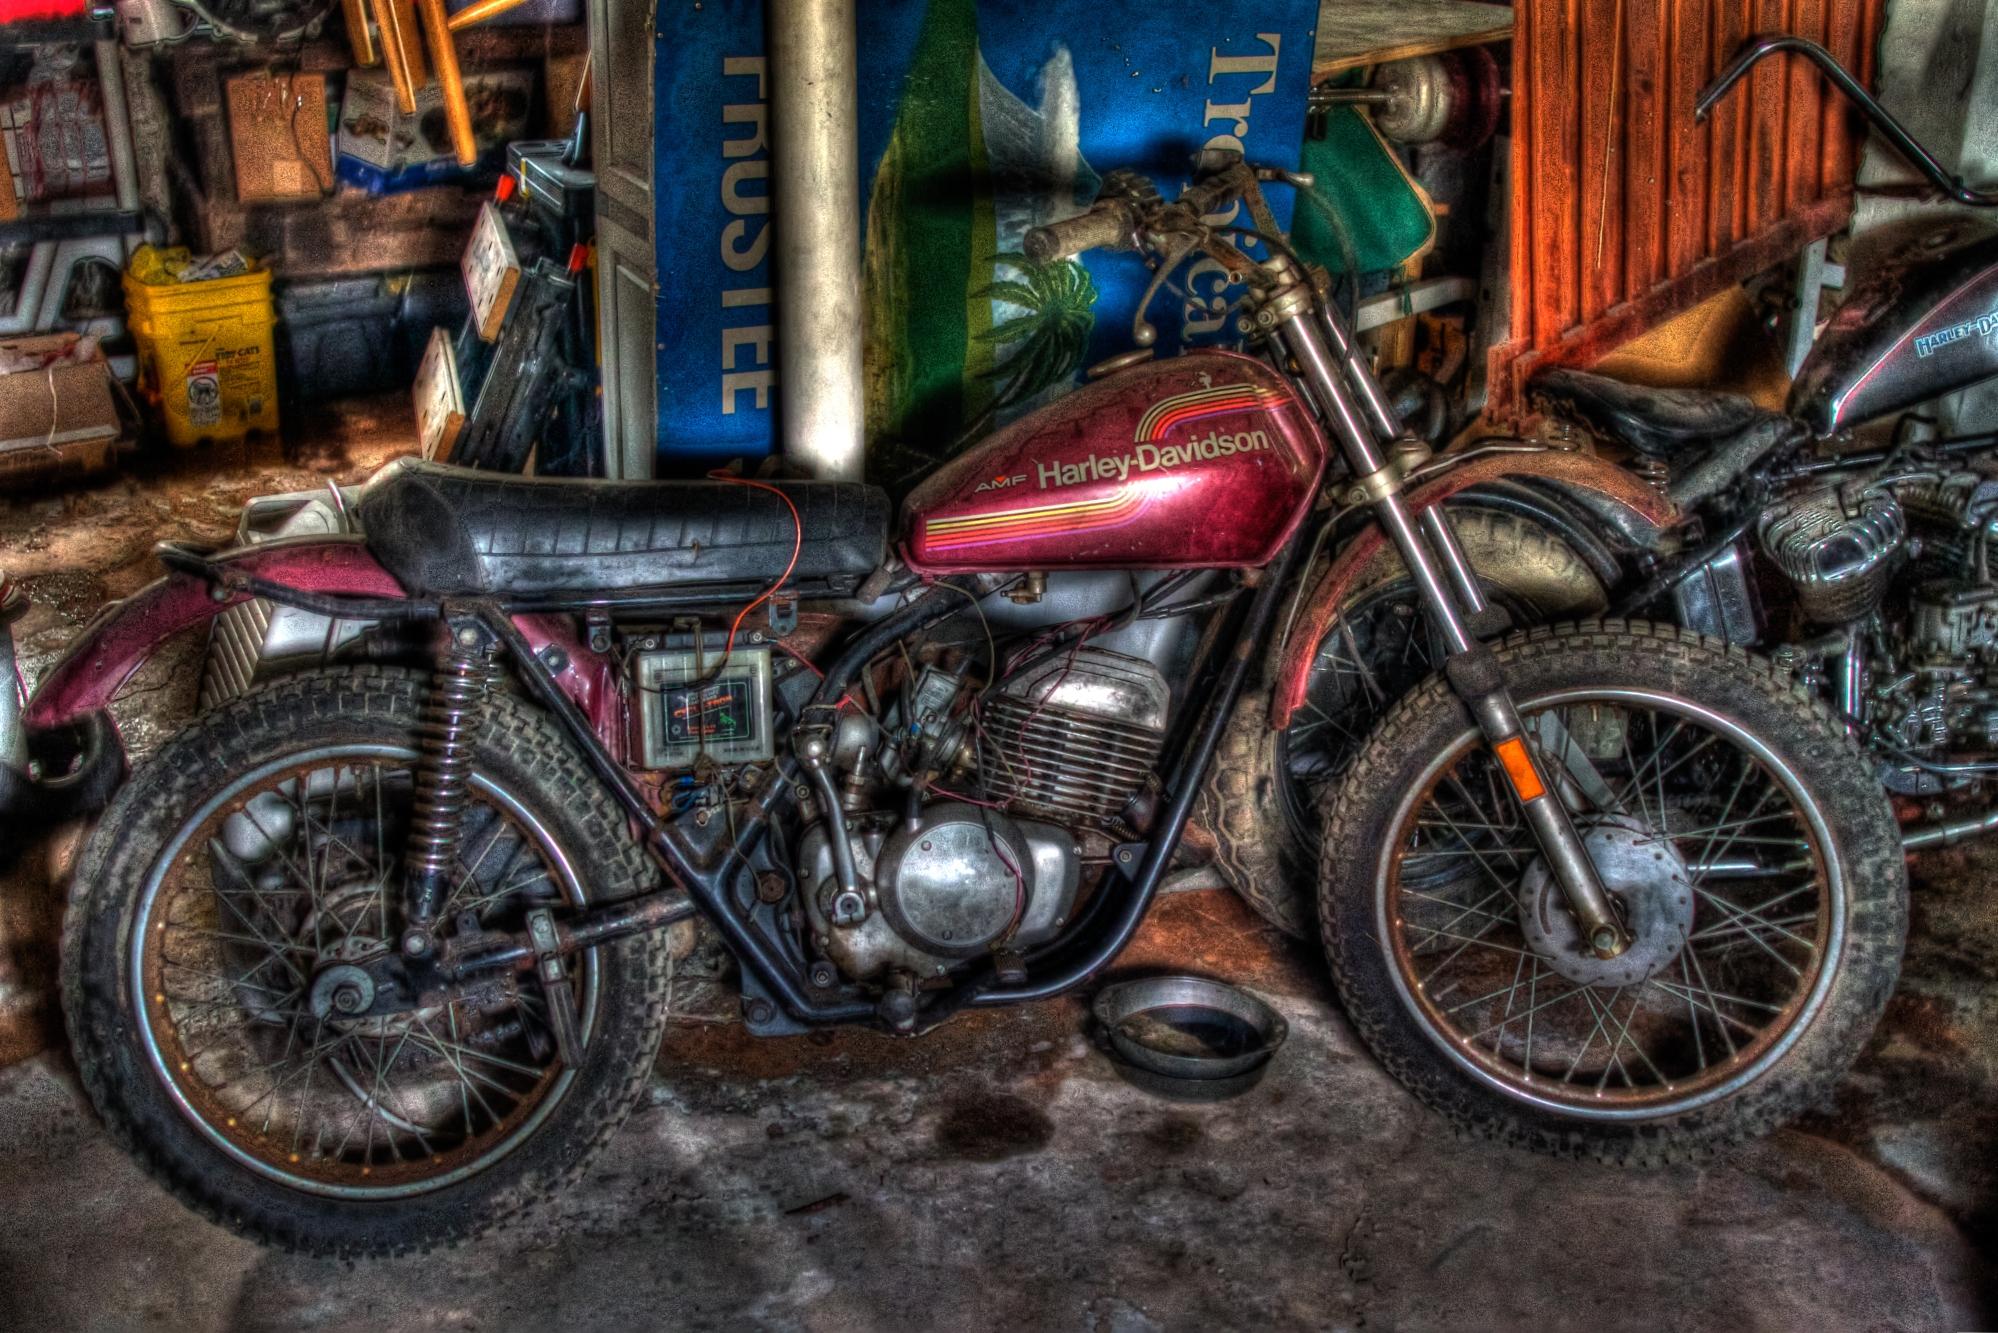 EverydaySurreal motorcycle